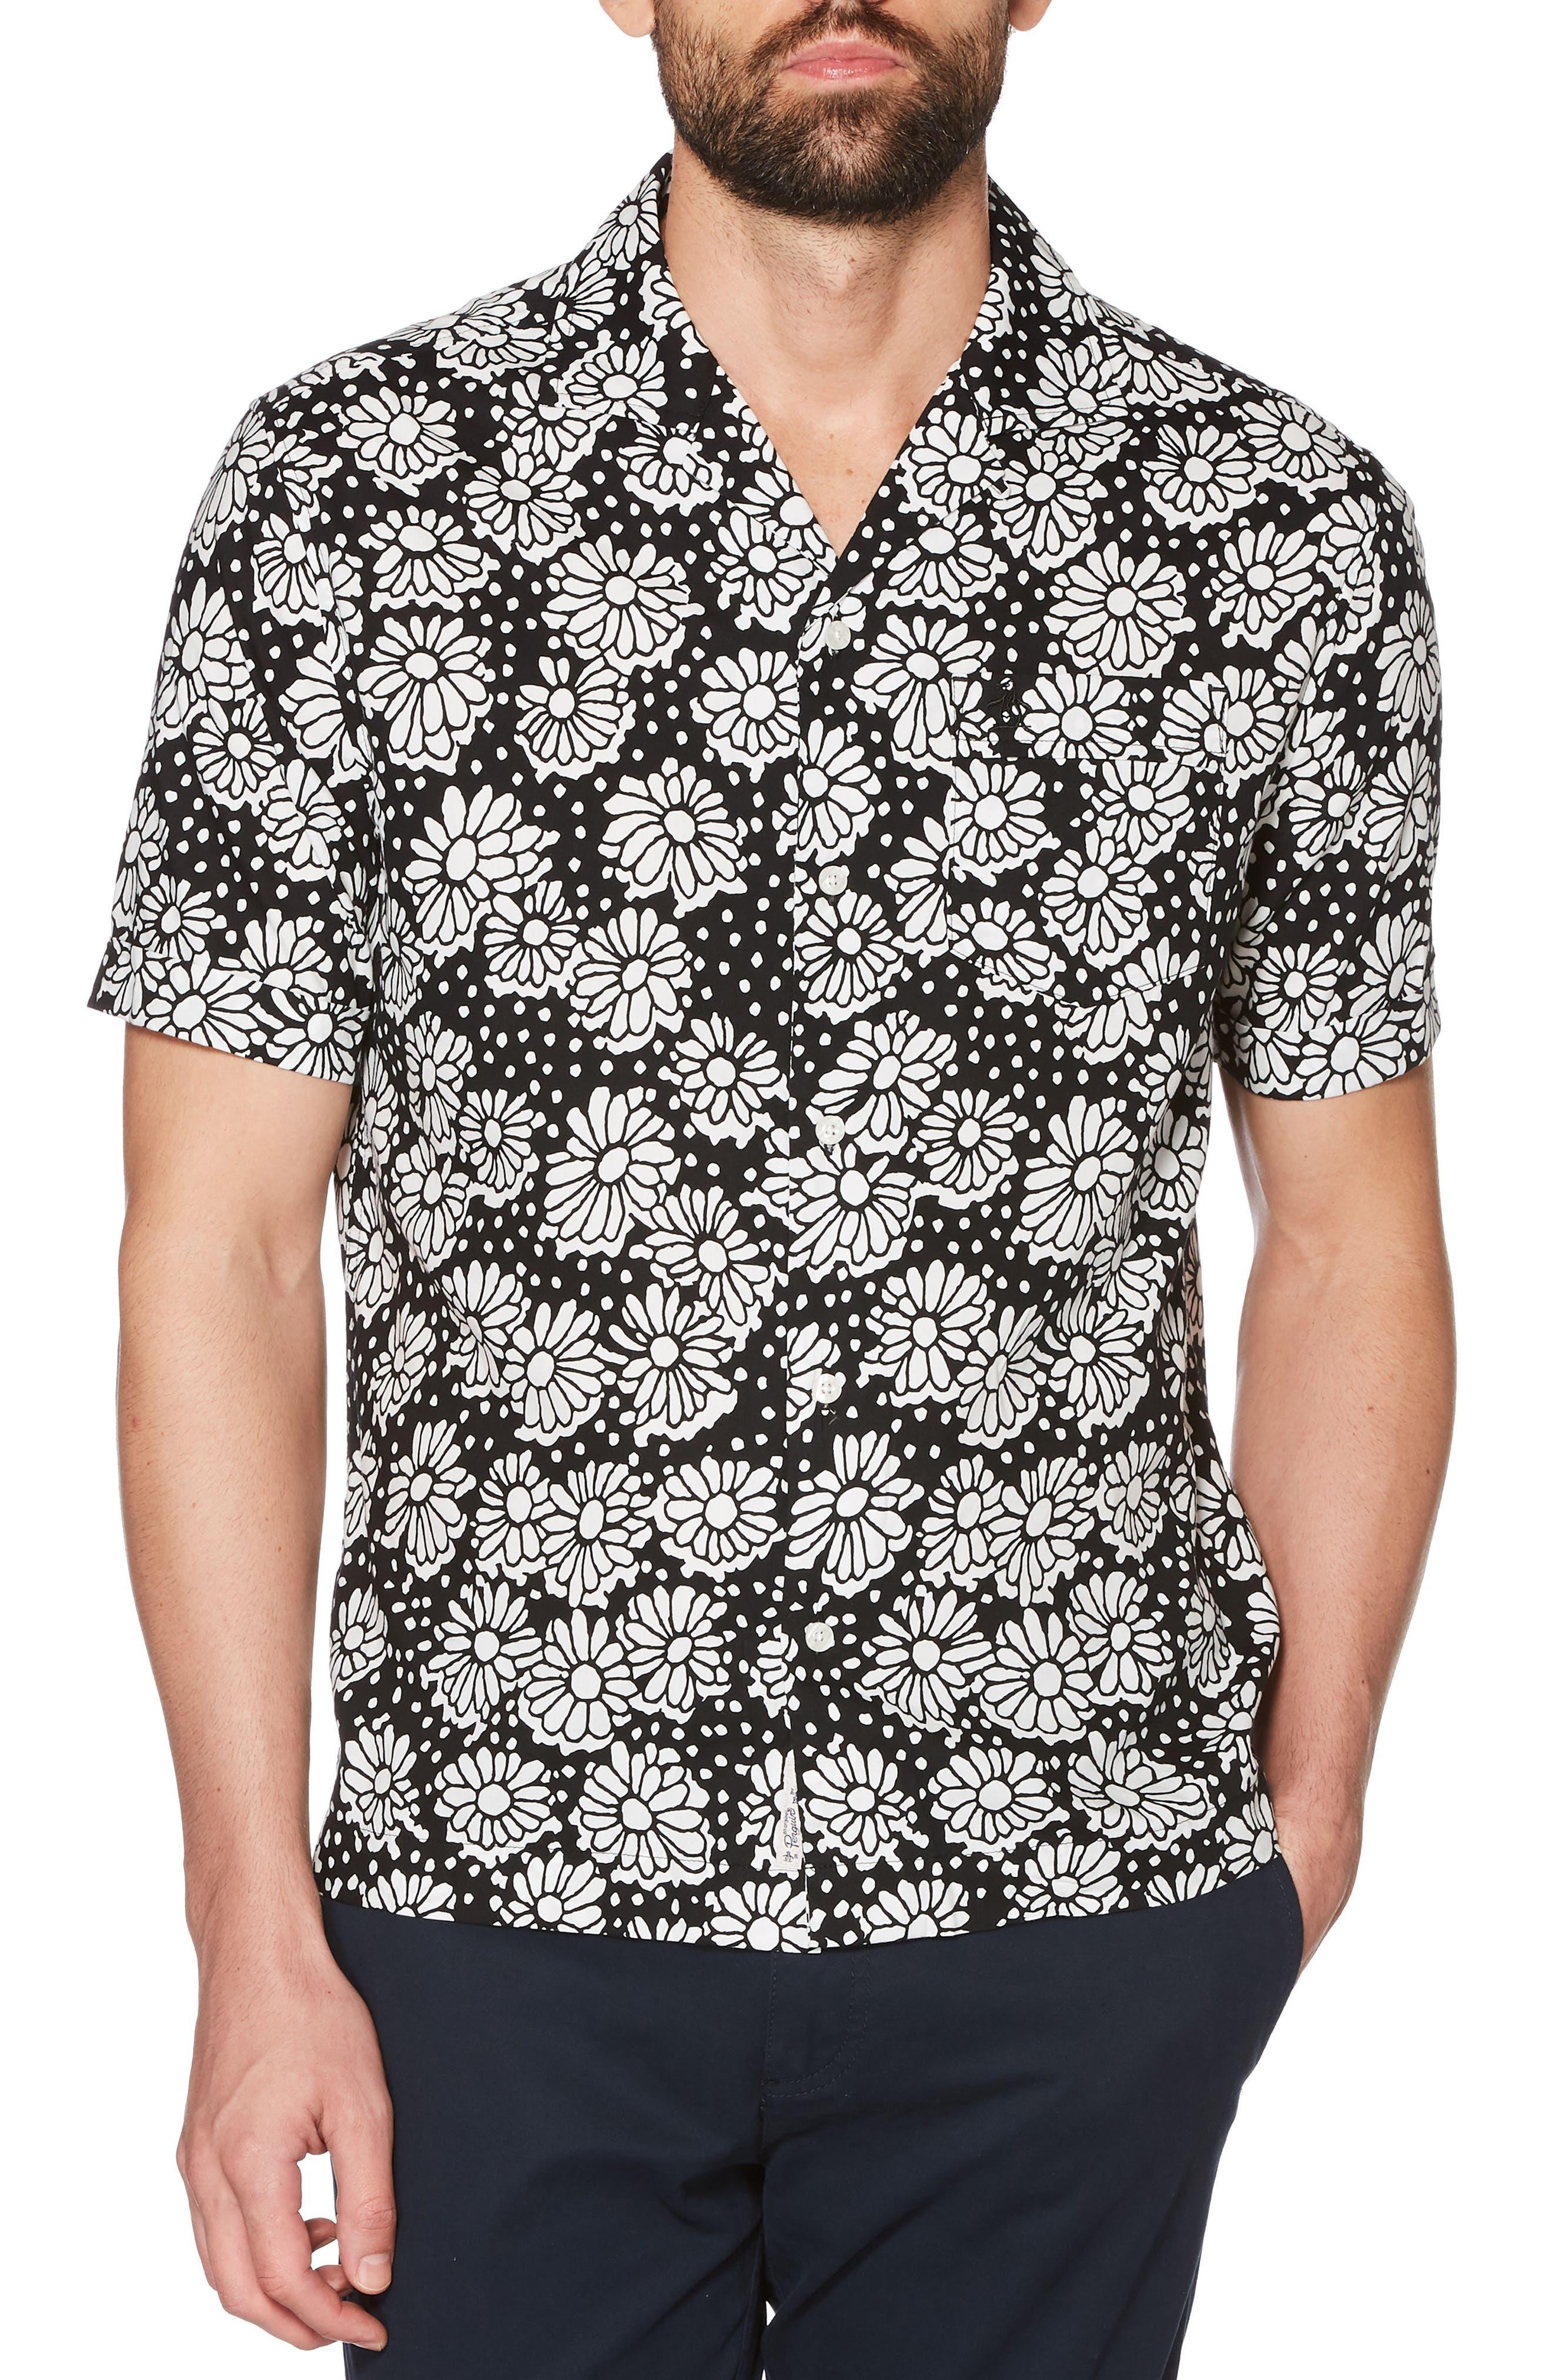 Daisy Print Camp Shirt,                             Main thumbnail 1, color,                             True Black